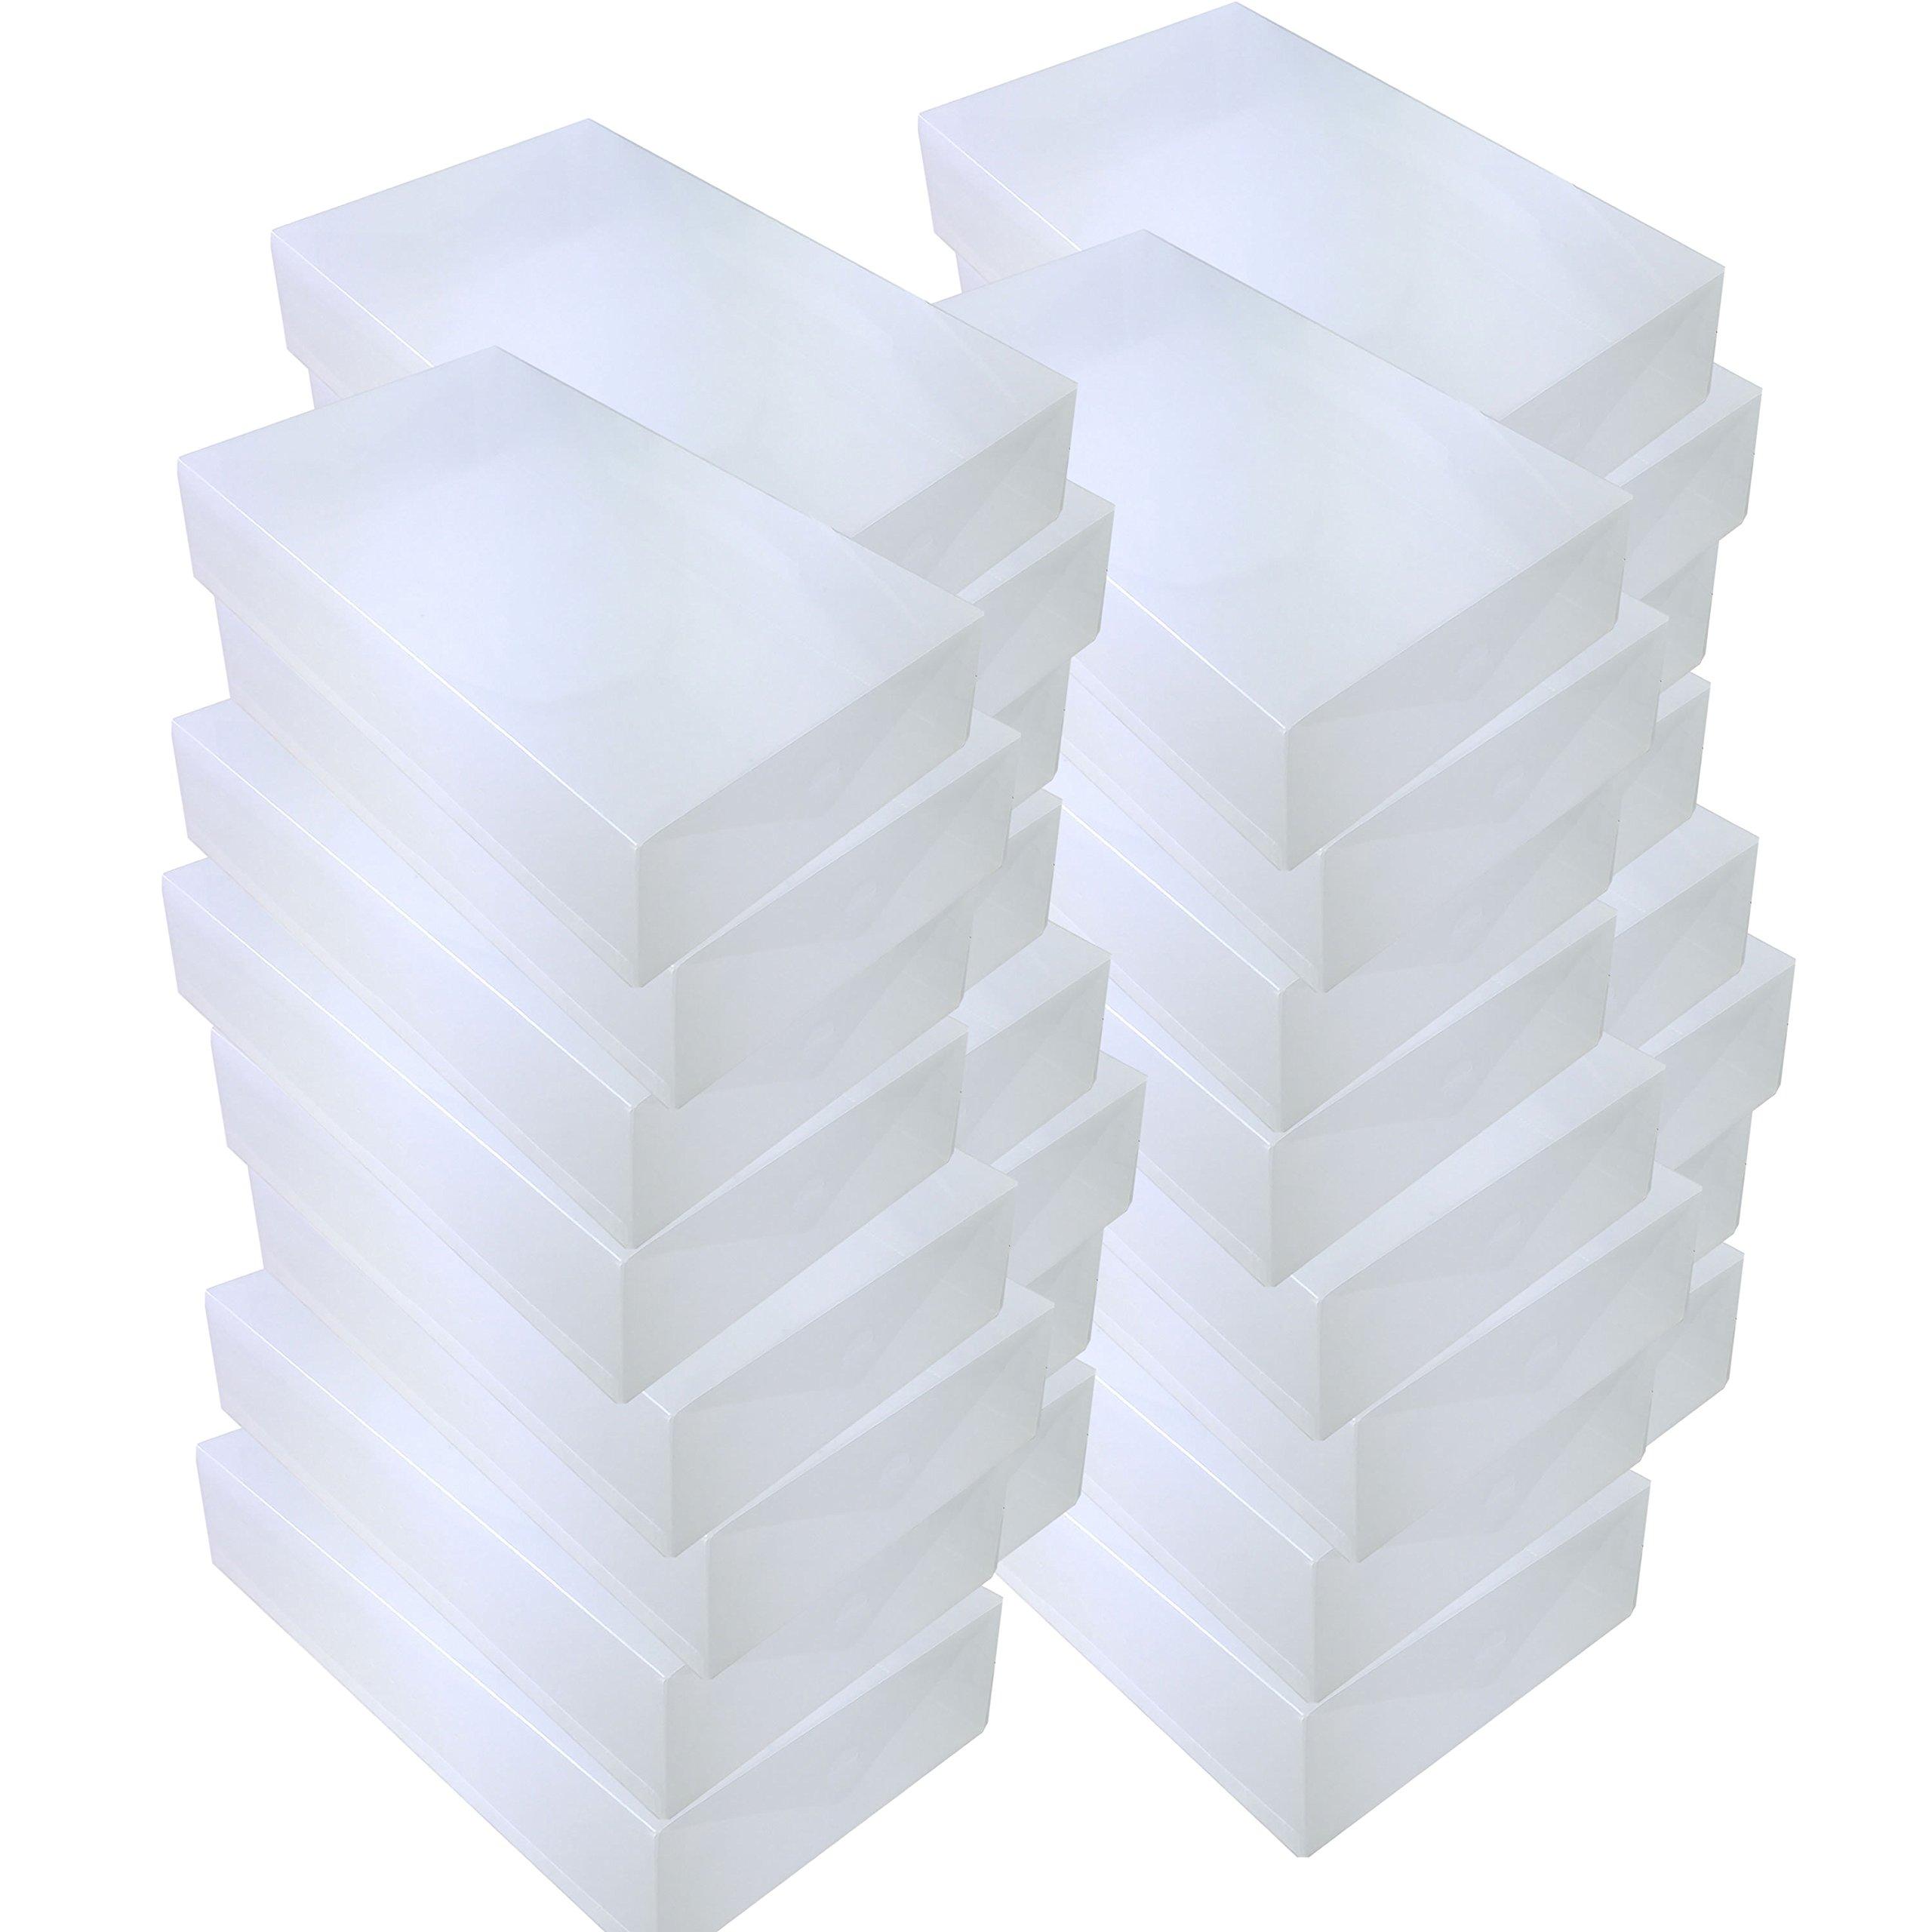 DynaSun 30x PP436 Cajas de Almacenaje Para Botas Apilable Plegable Contenedor Organizador Transparente para Hombres Damas y Señoras: Amazon.es: Hogar